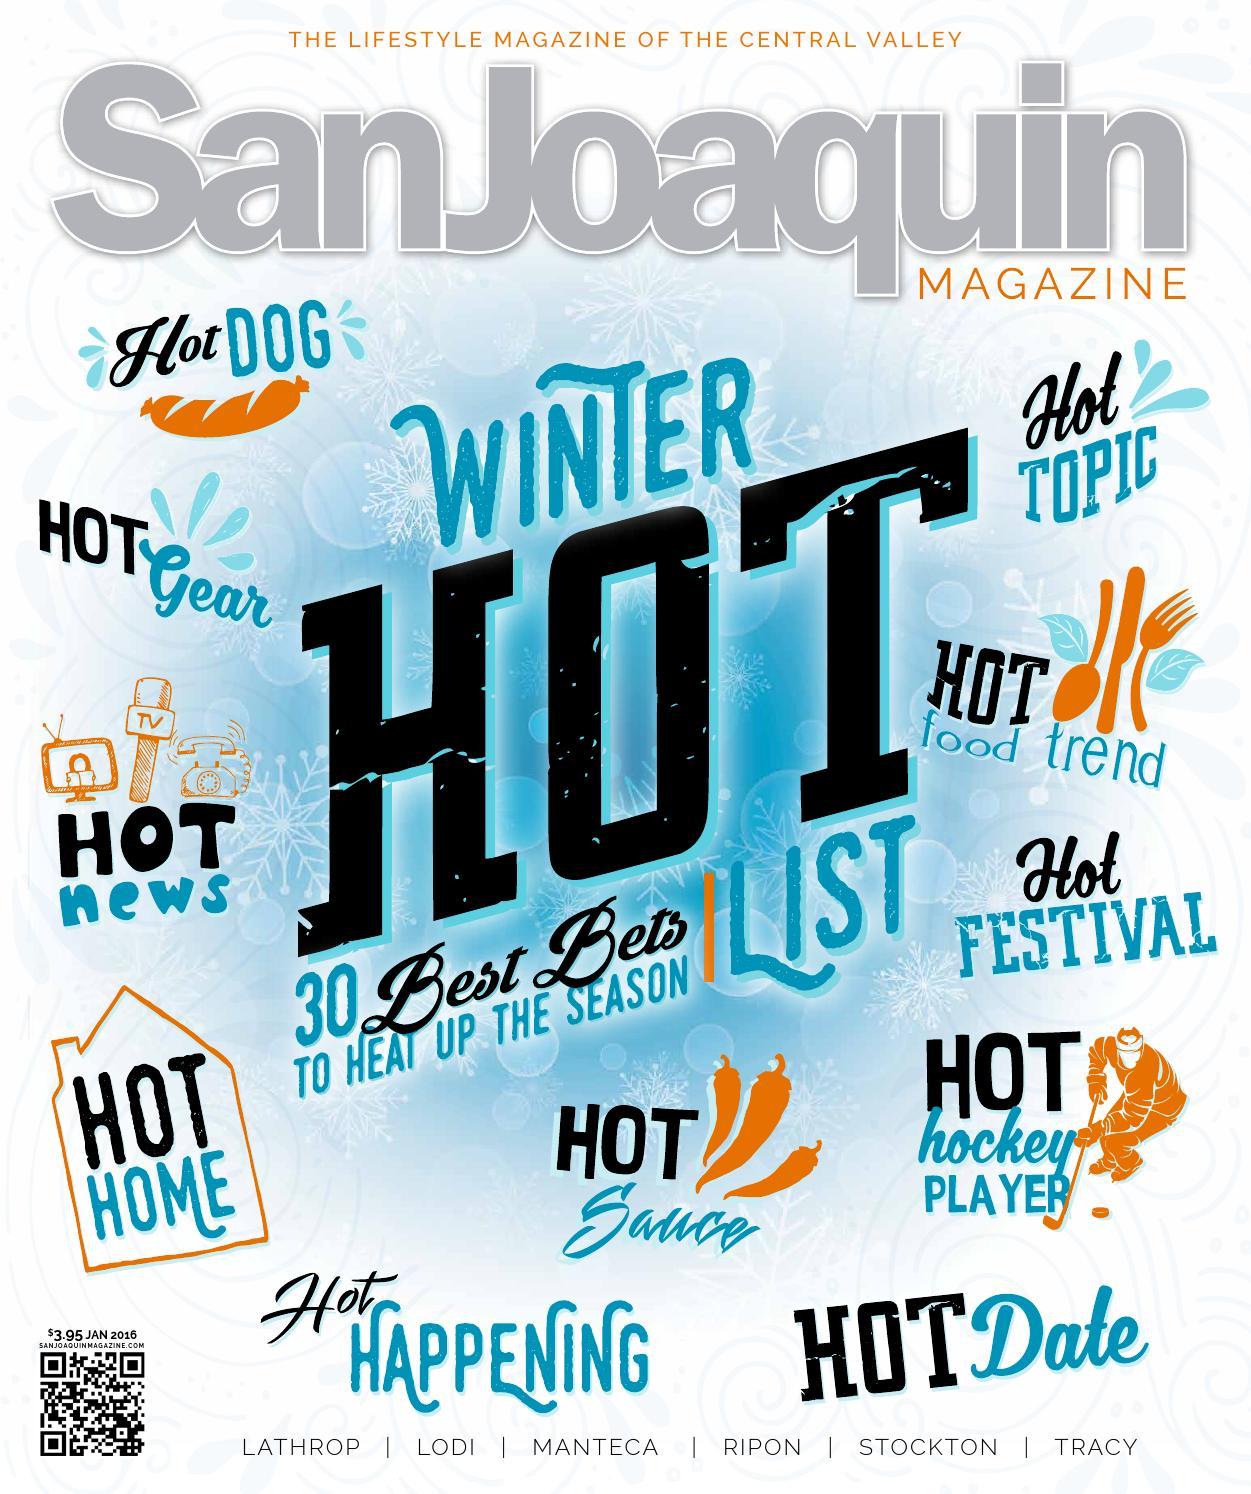 San joaquin magazine january 2016 by san joaquin magazine issuu aiddatafo Gallery